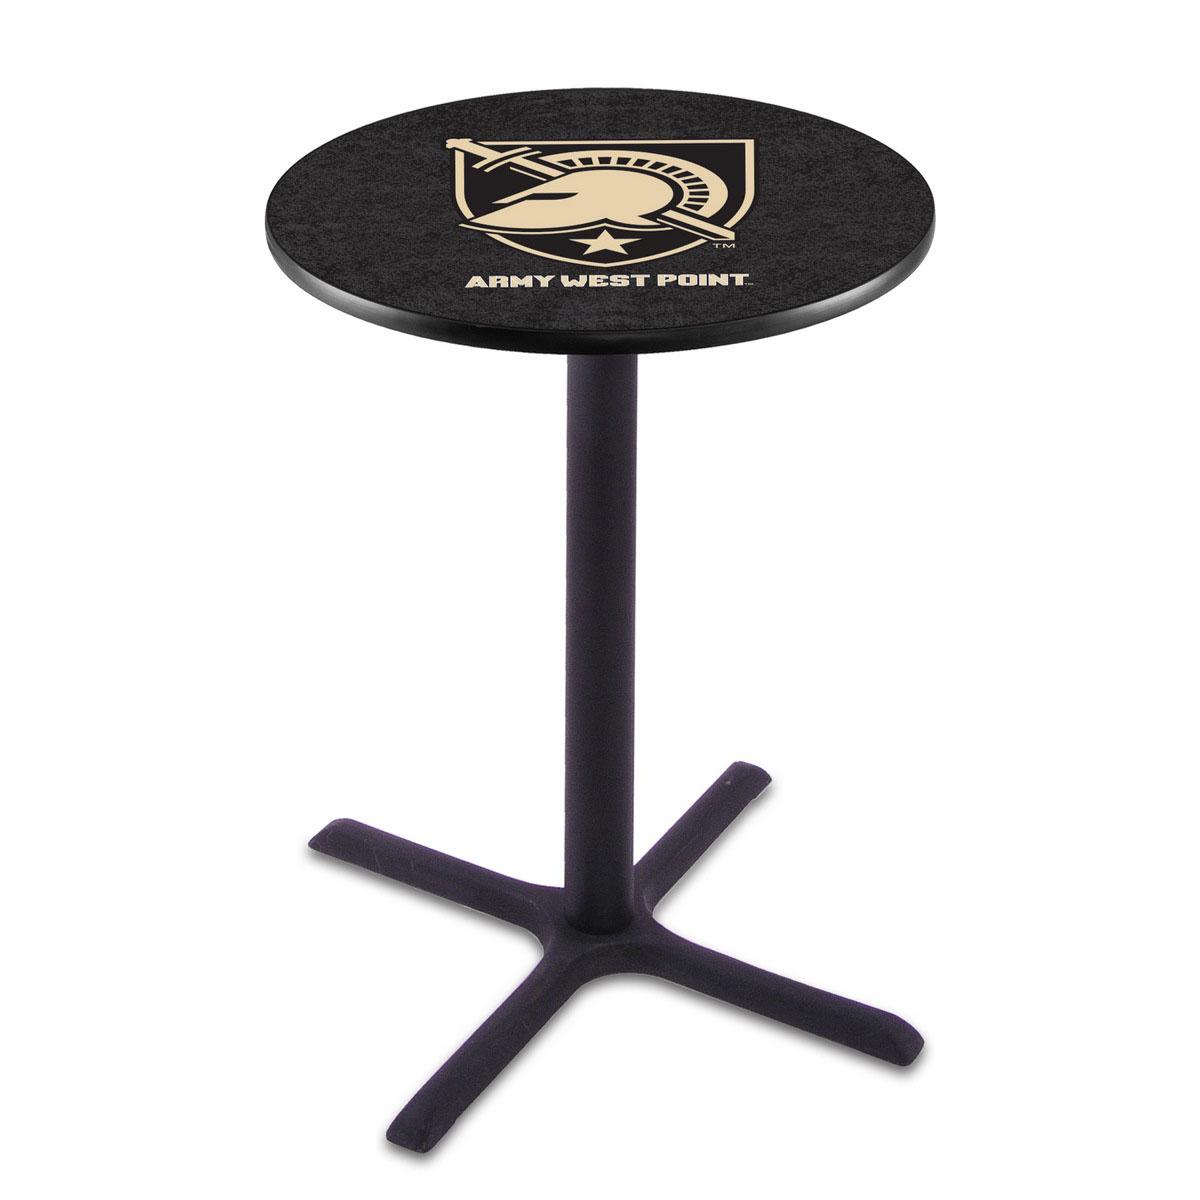 New US Military Academy Black Wrinkle Pub Table Product Photo